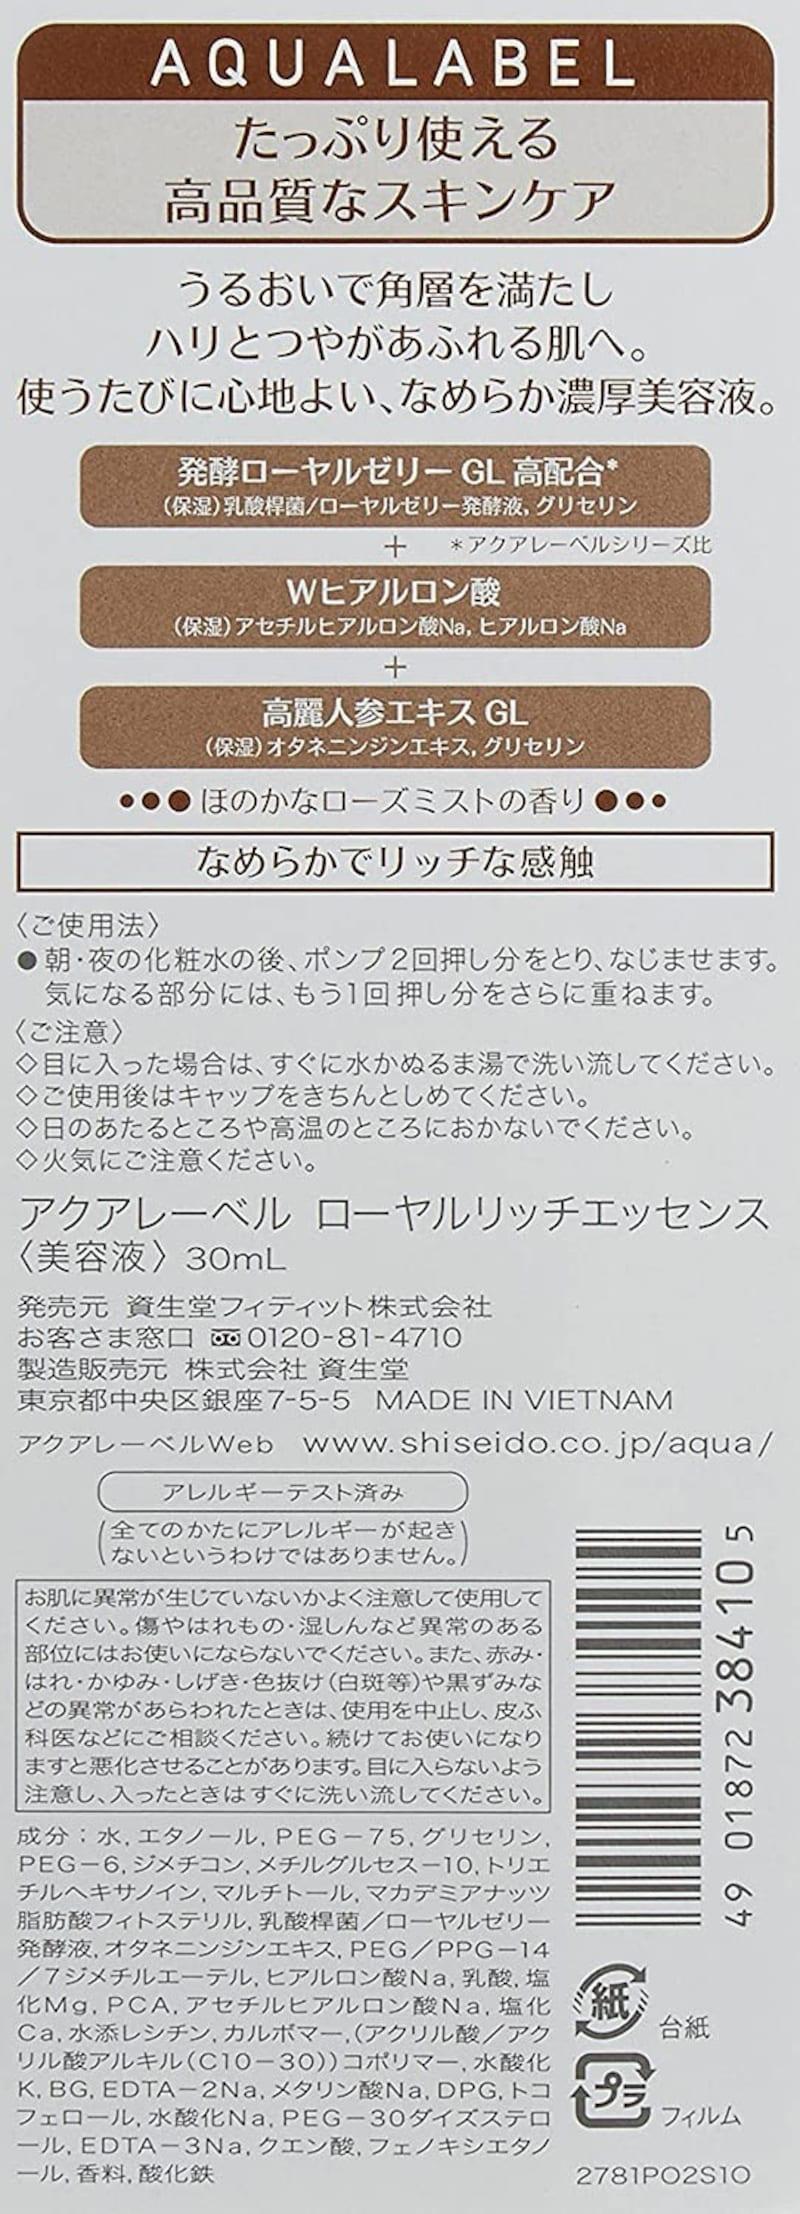 SHISEIDO(資生堂),AQUALABEL(アクアレーベル) ローヤルリッチエッセンス